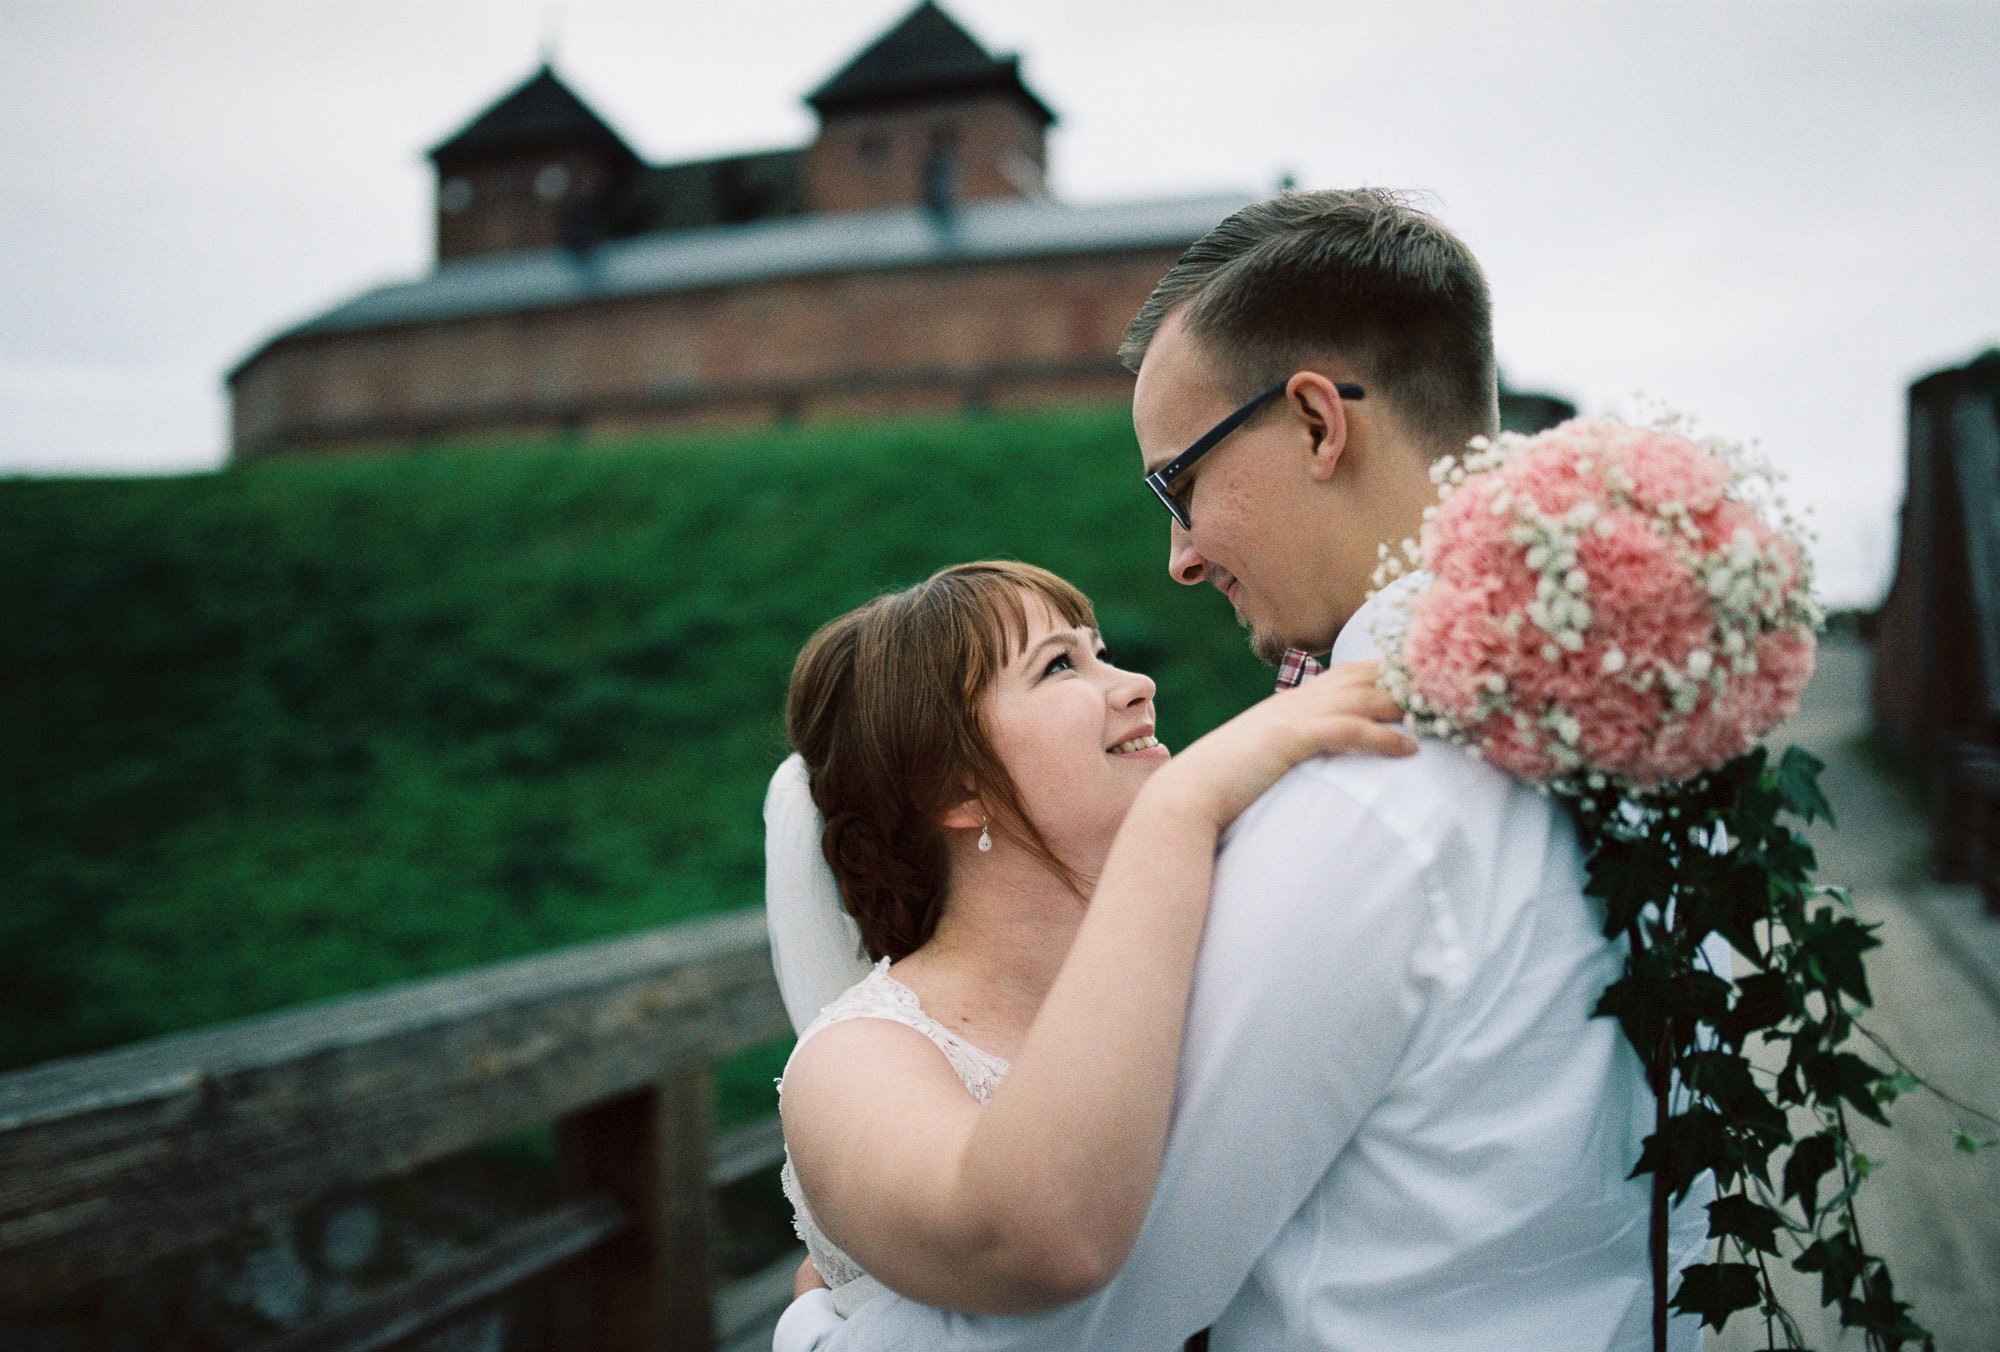 jere-satamo-analog-film-wedding-photographer-finland-160.jpg